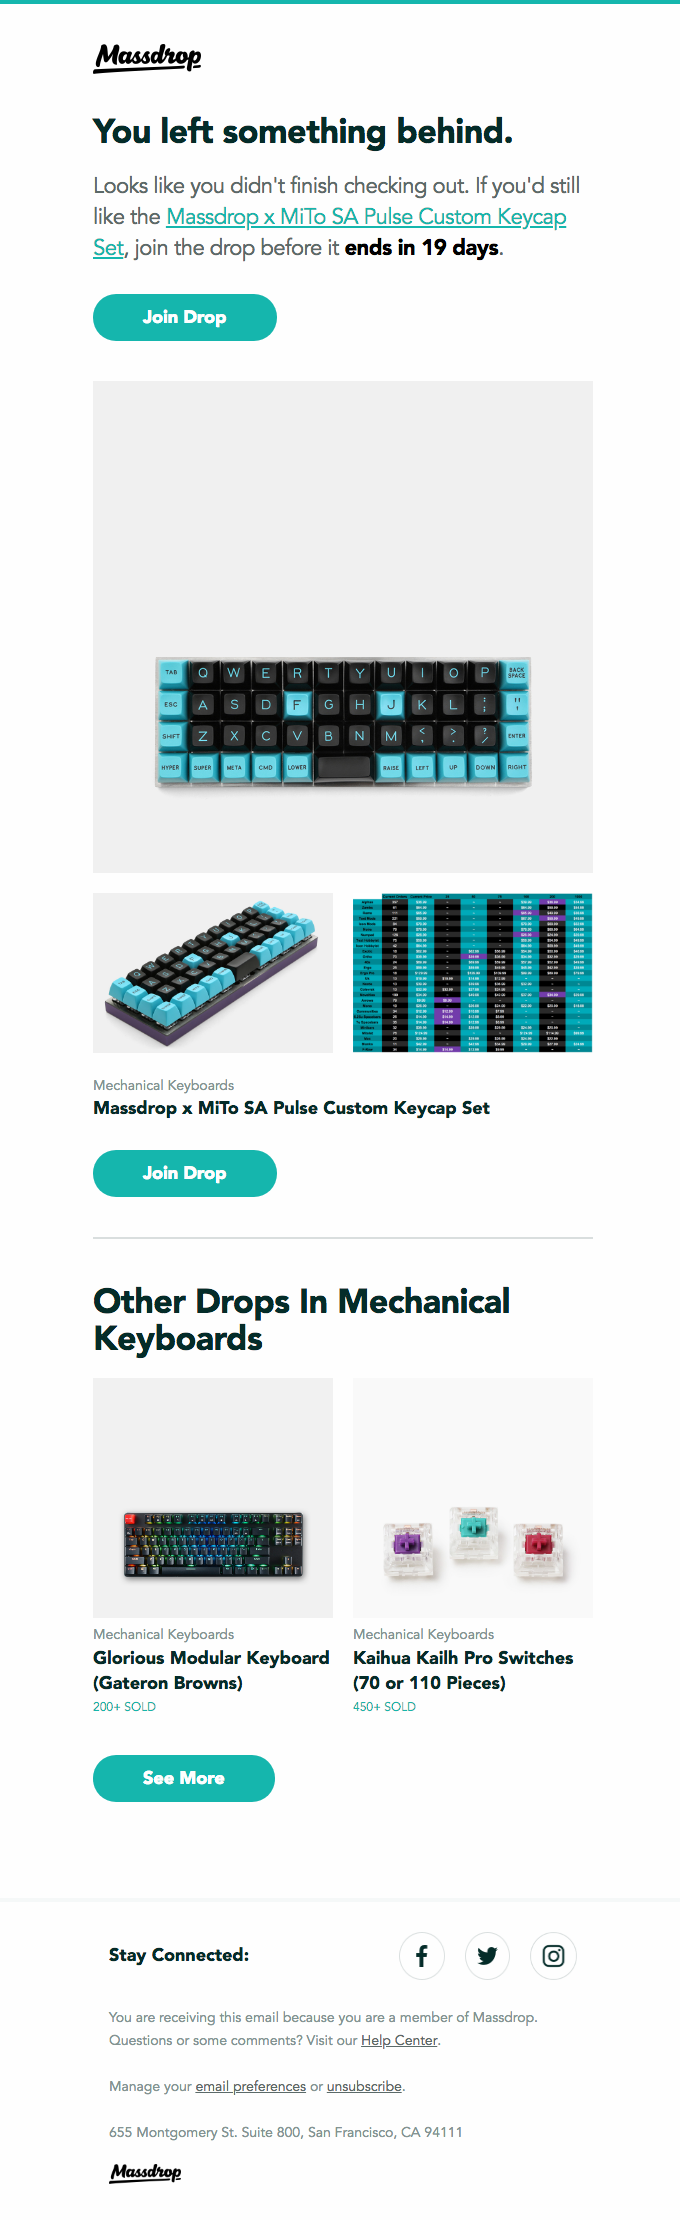 Smiles Davis, still interested in the Massdrop x MiTo SA Pulse Custom Keycap Set?